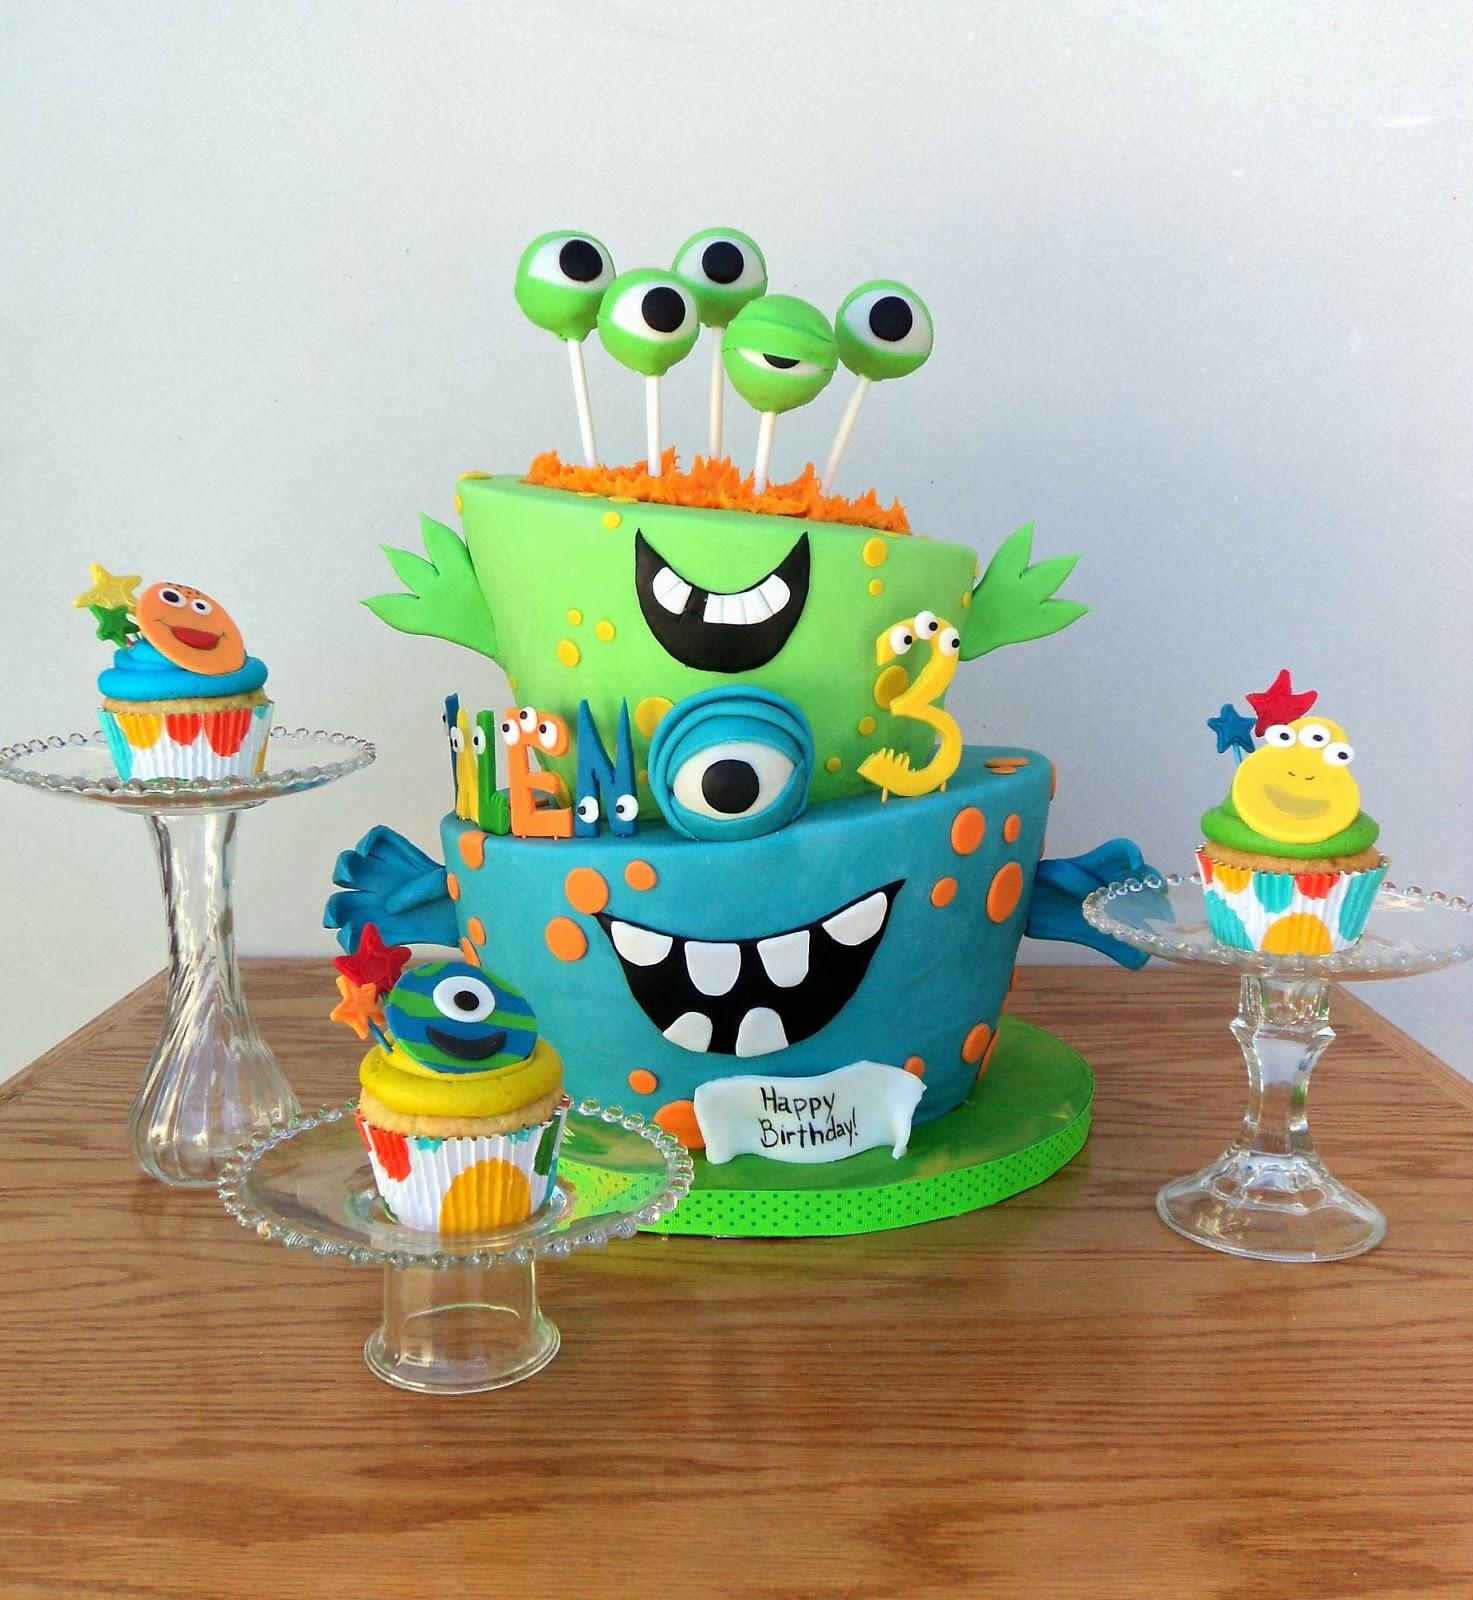 Astonishing 11 Little Monster Birthday Cupcakes Photo Little Monster Funny Birthday Cards Online Inifofree Goldxyz